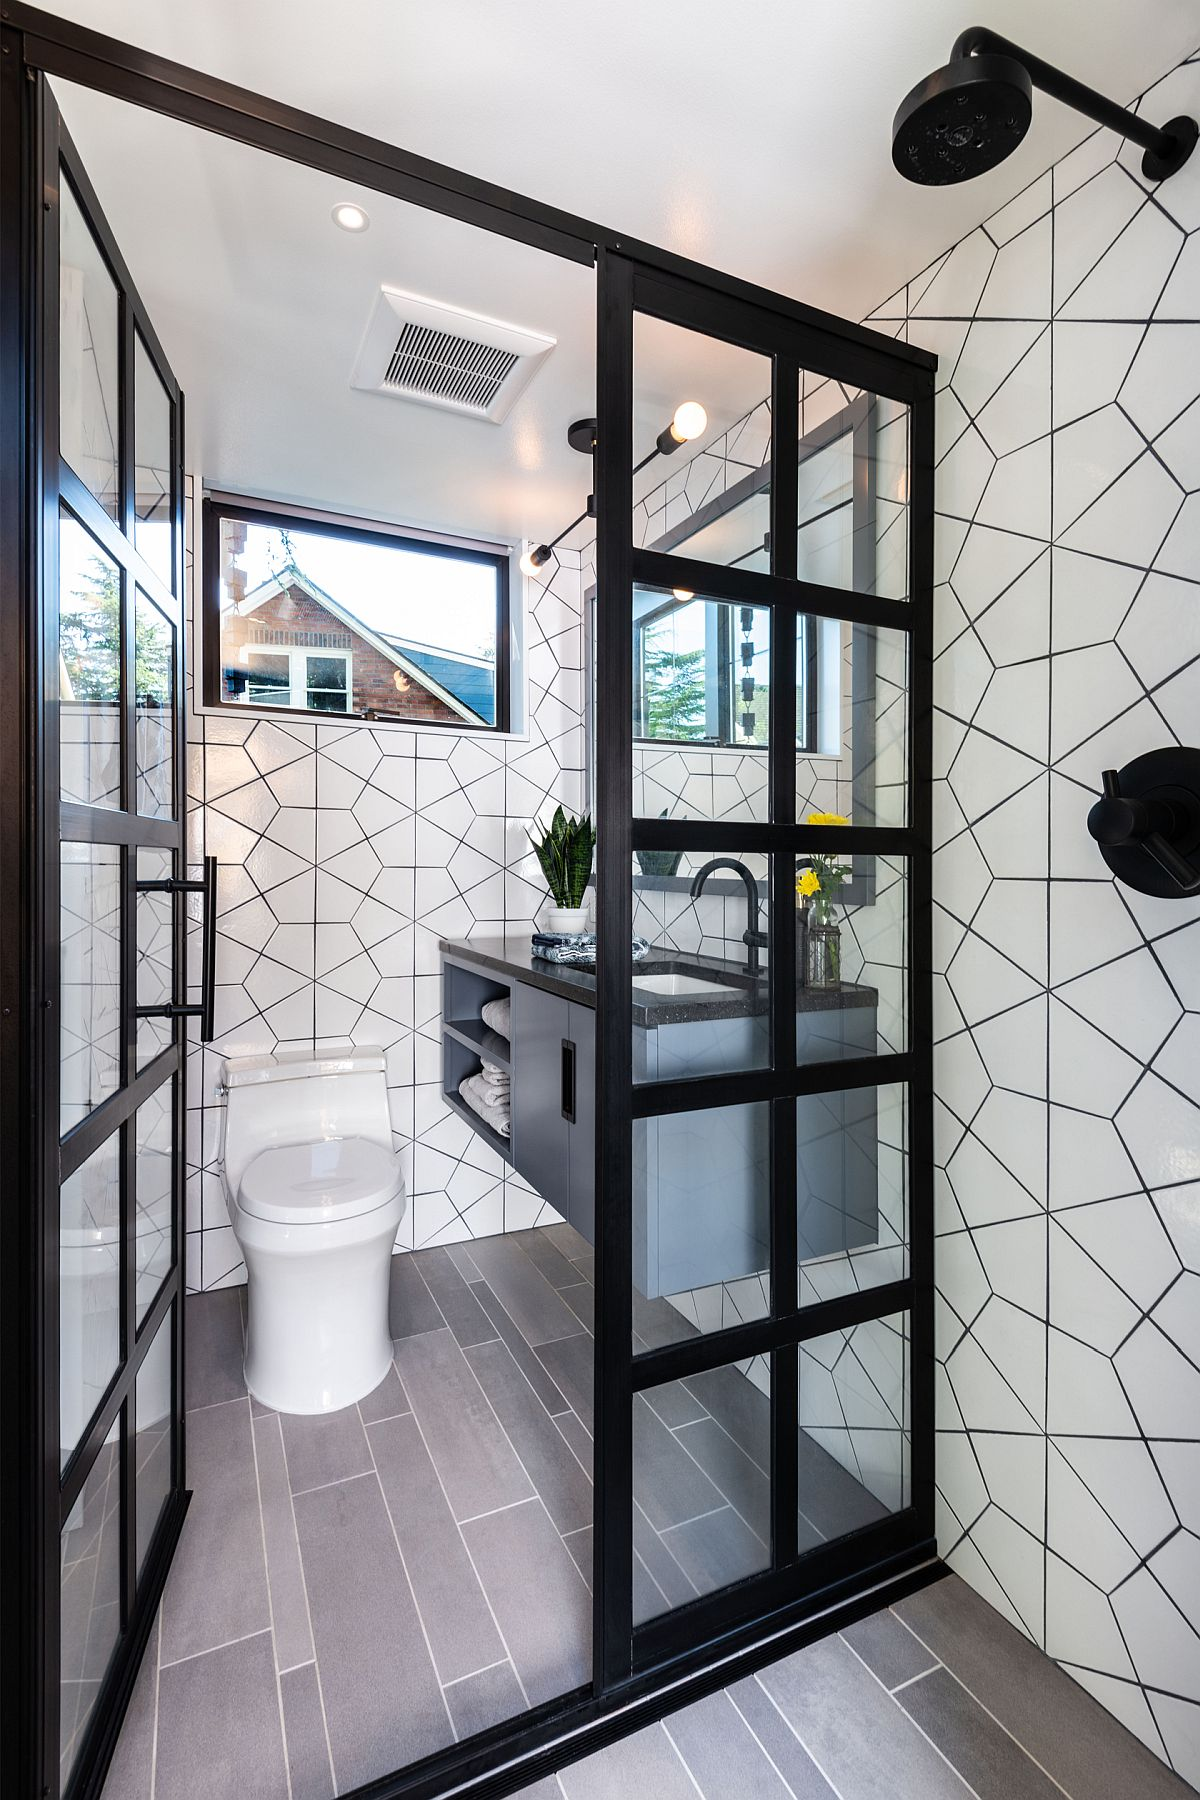 Modern bathroom in blacka nd white with geo pattern